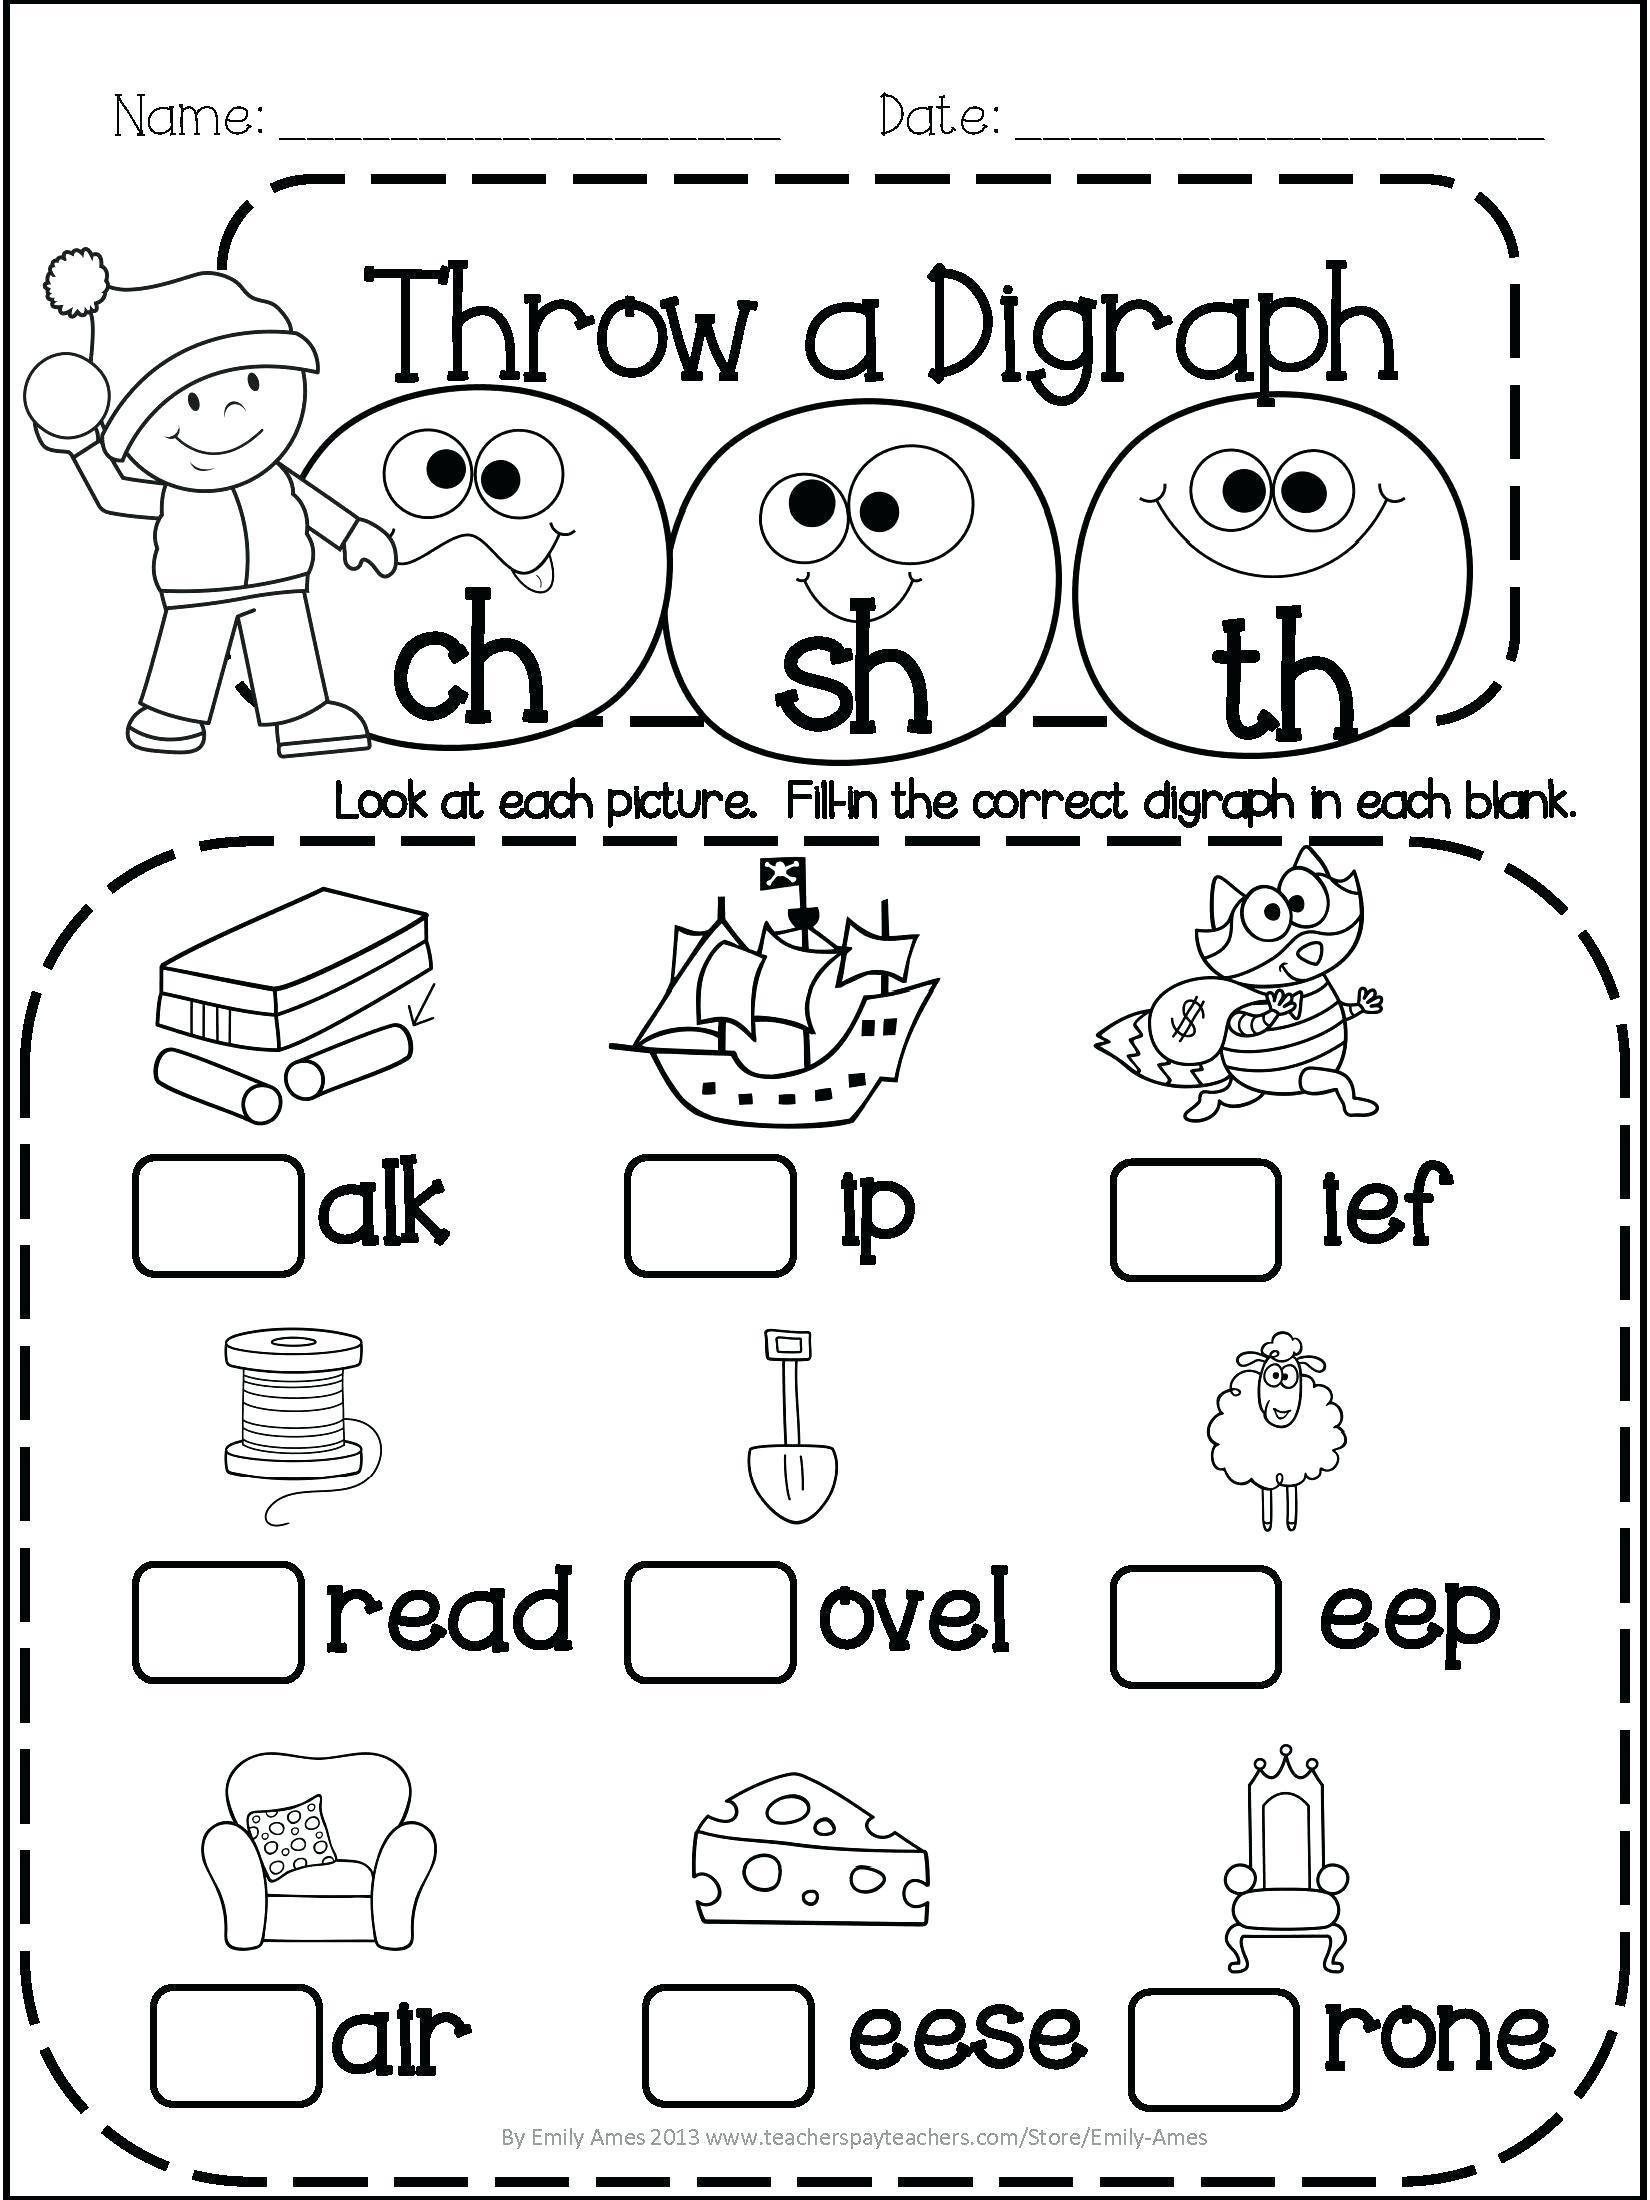 10 Math Homework Worksheets For Grade 1 In